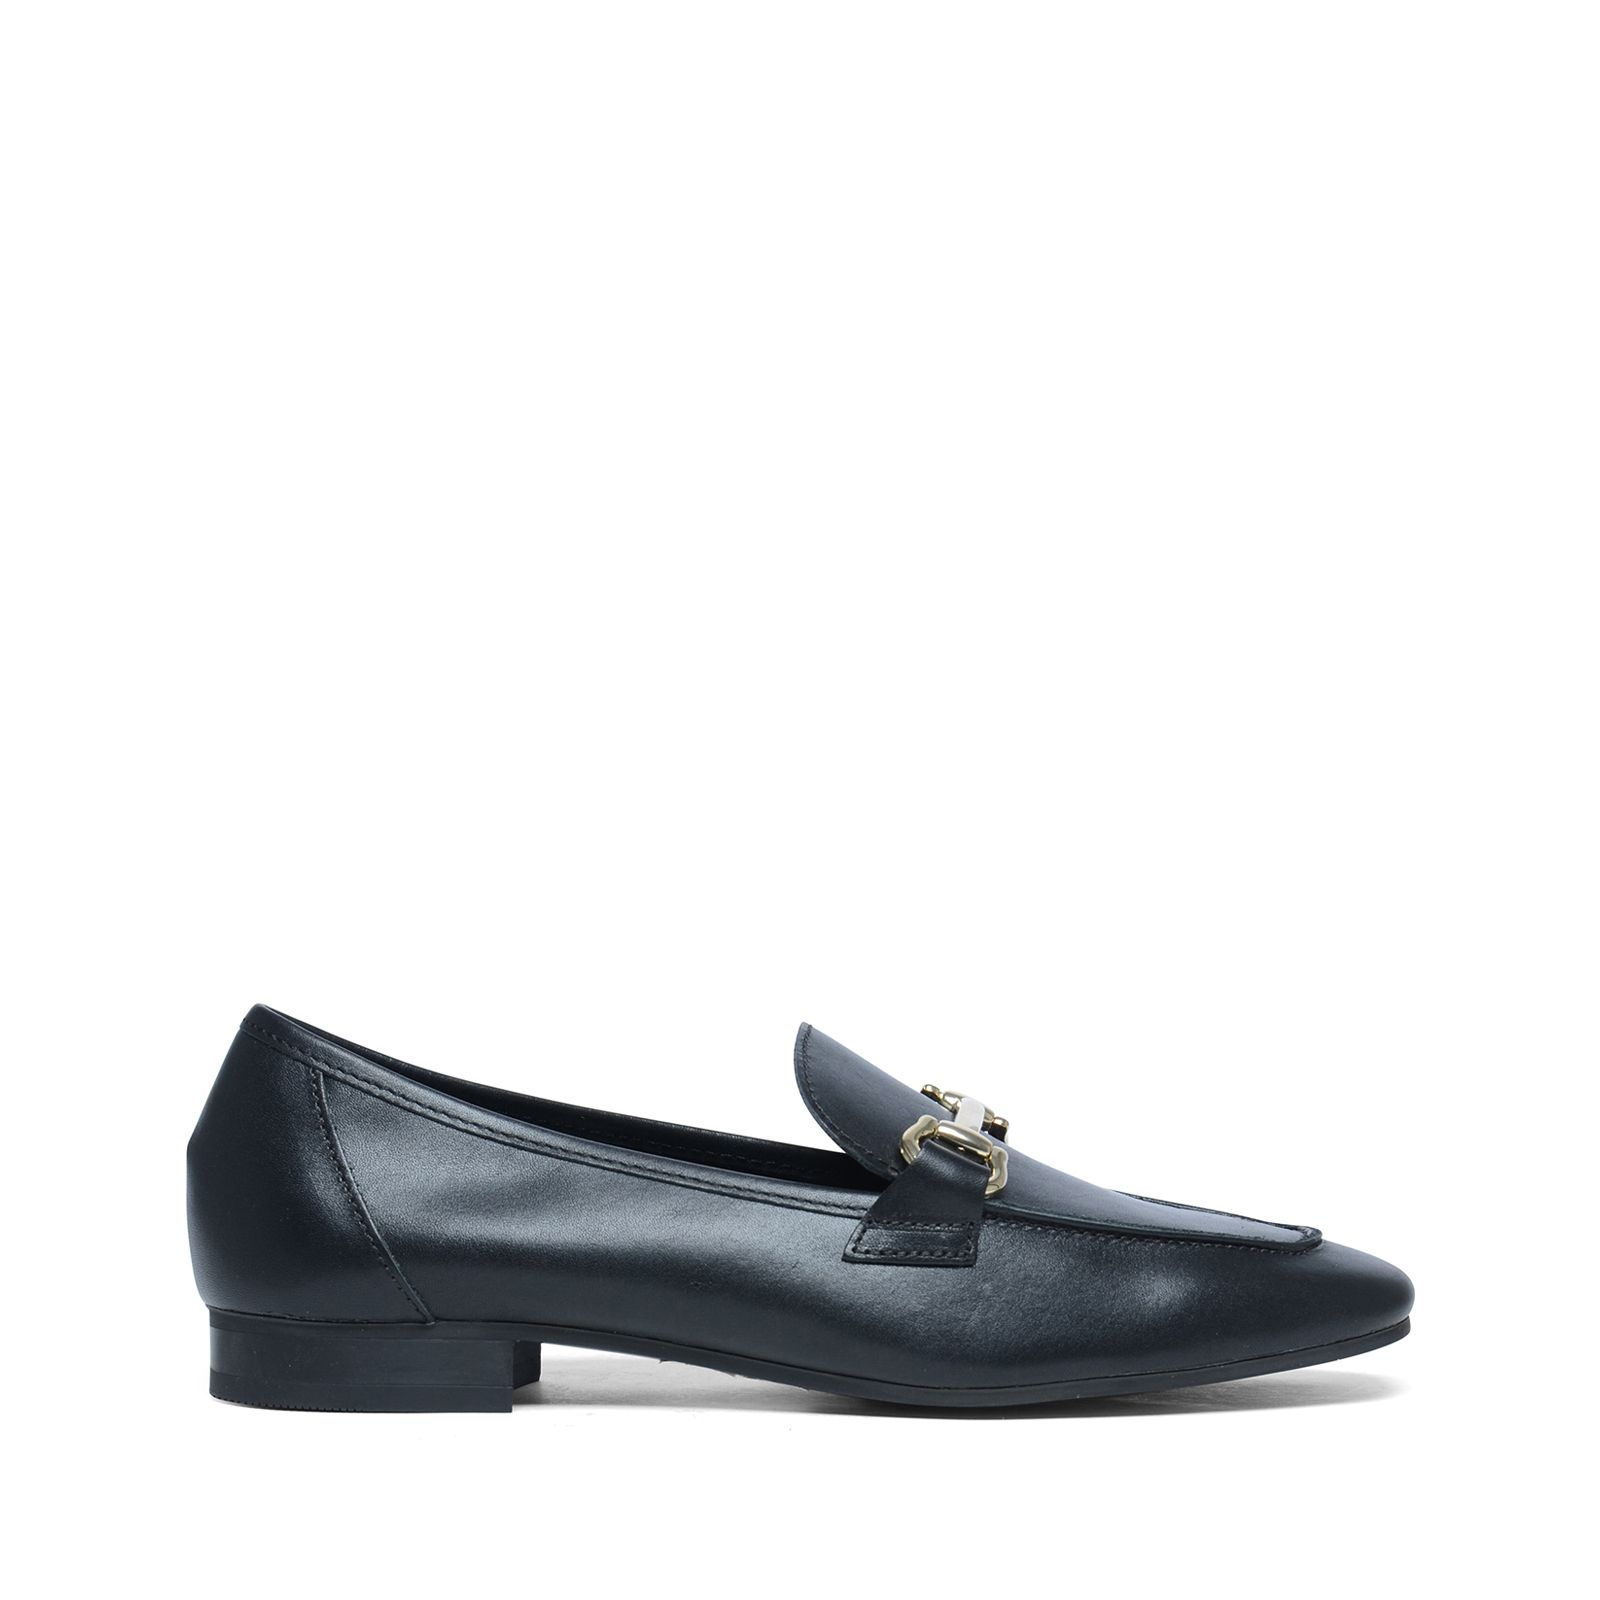 Braend Chaussures Habillées Bleu 24508 Braend